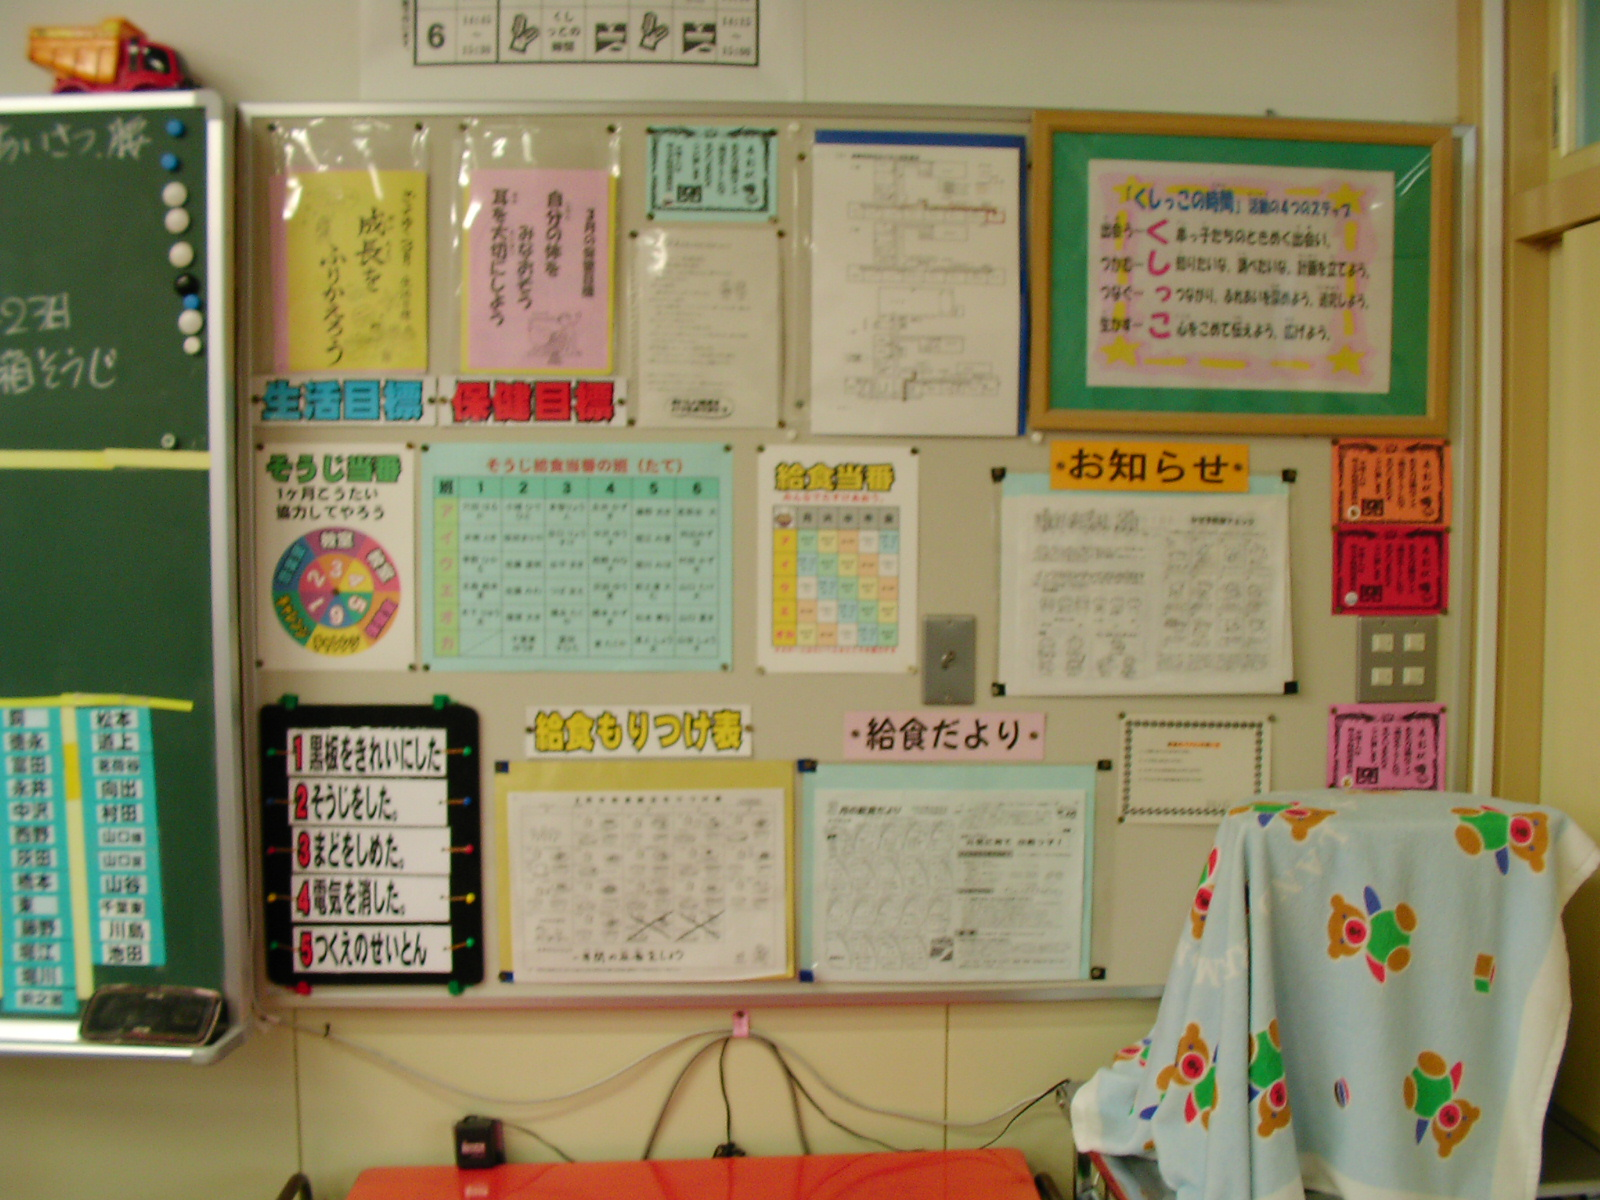 SANY0085.JPG: 教室の掲示物 ... : 小学校4年生 漢字 : 小学校